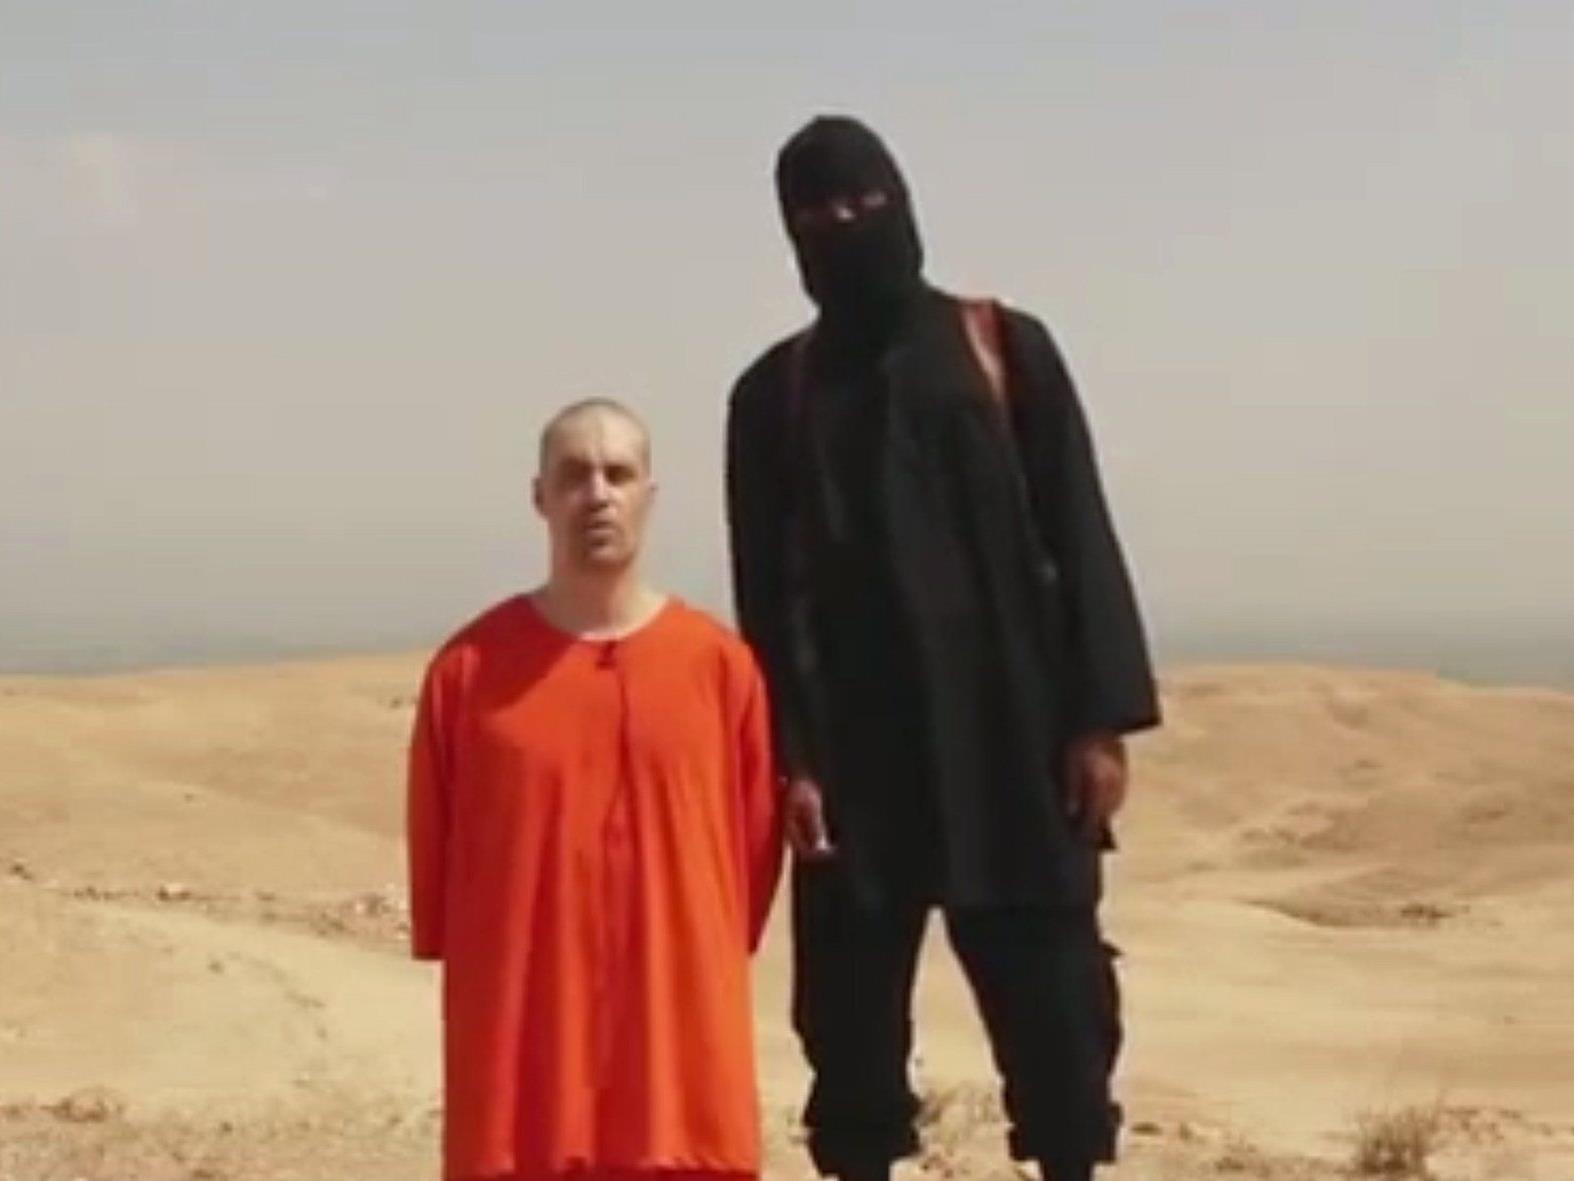 Eine Szene aus dem Video, kurz bevor James Foley enthauptet wird.